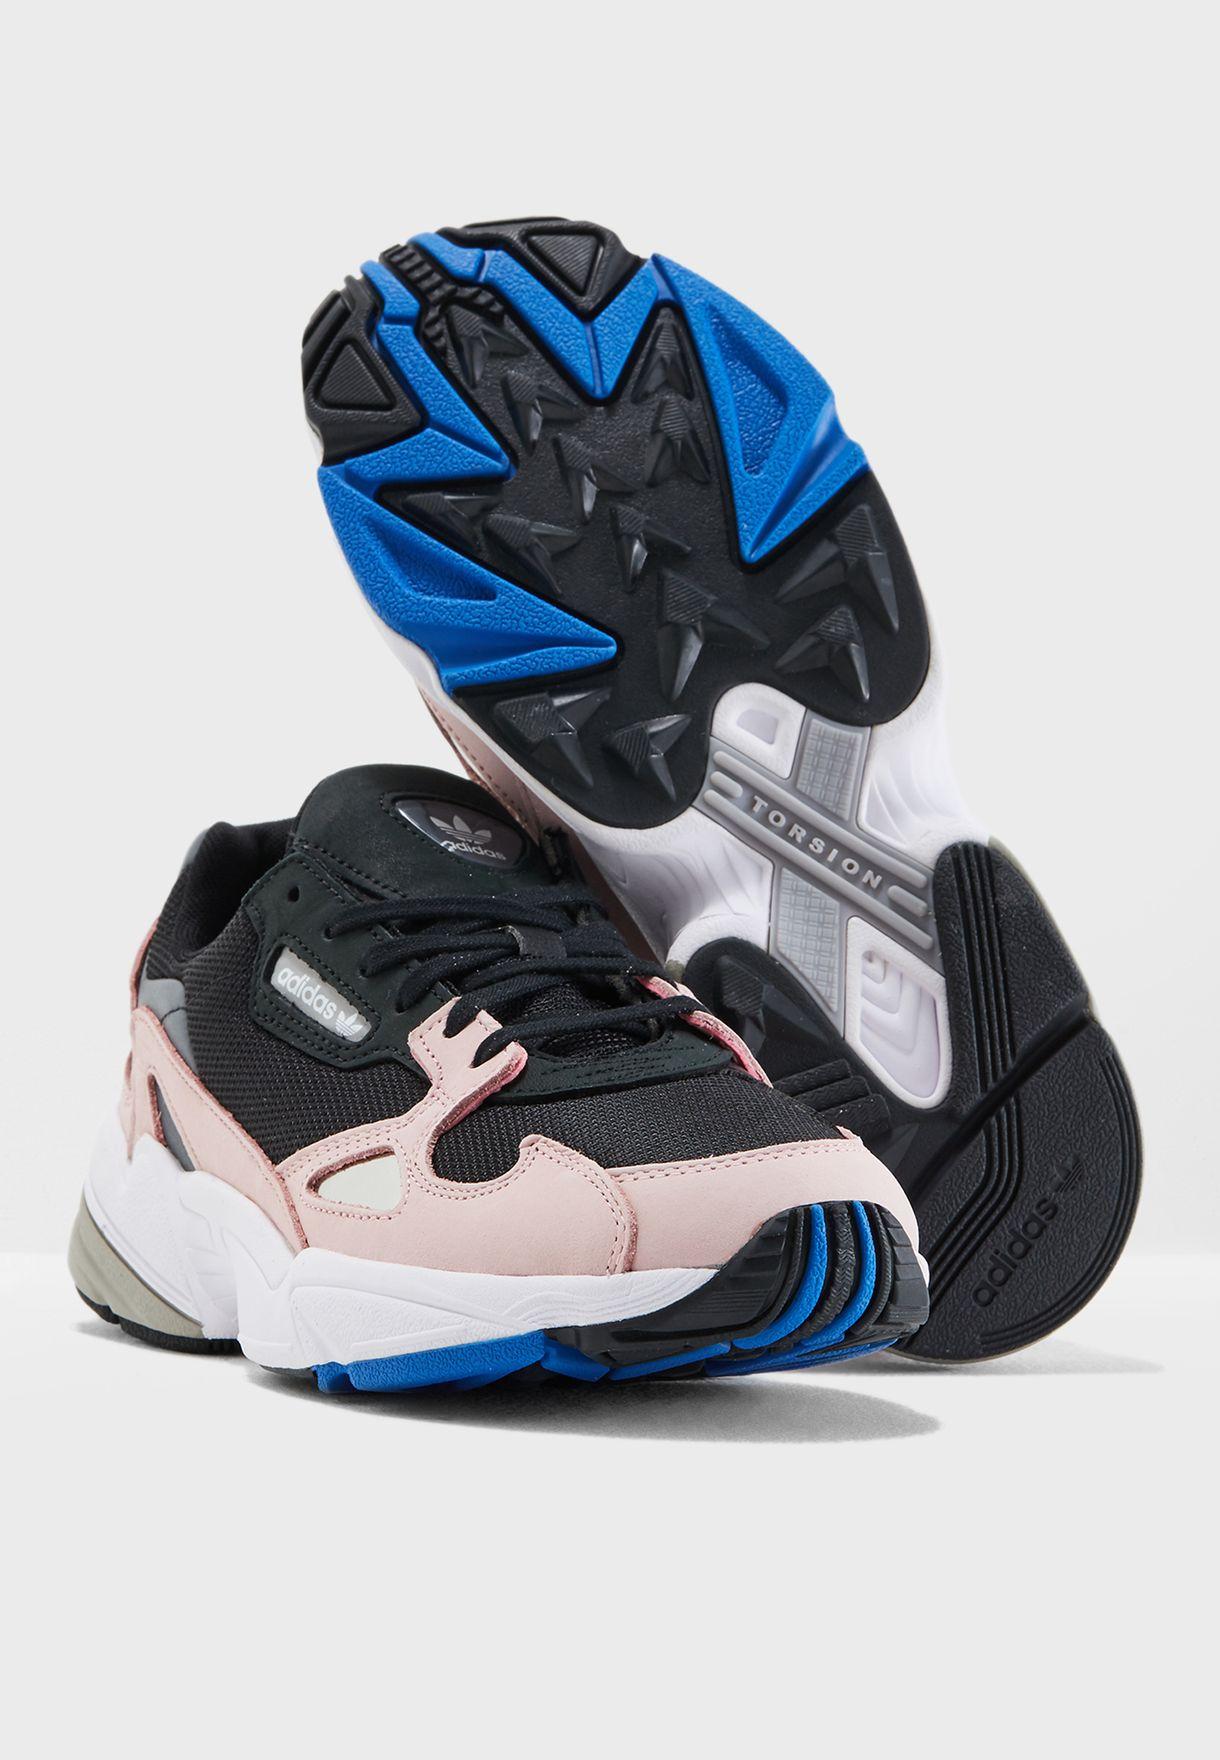 separation shoes 6345c d2108 Shop adidas Originals multicolor Falcon B28126 for Women in